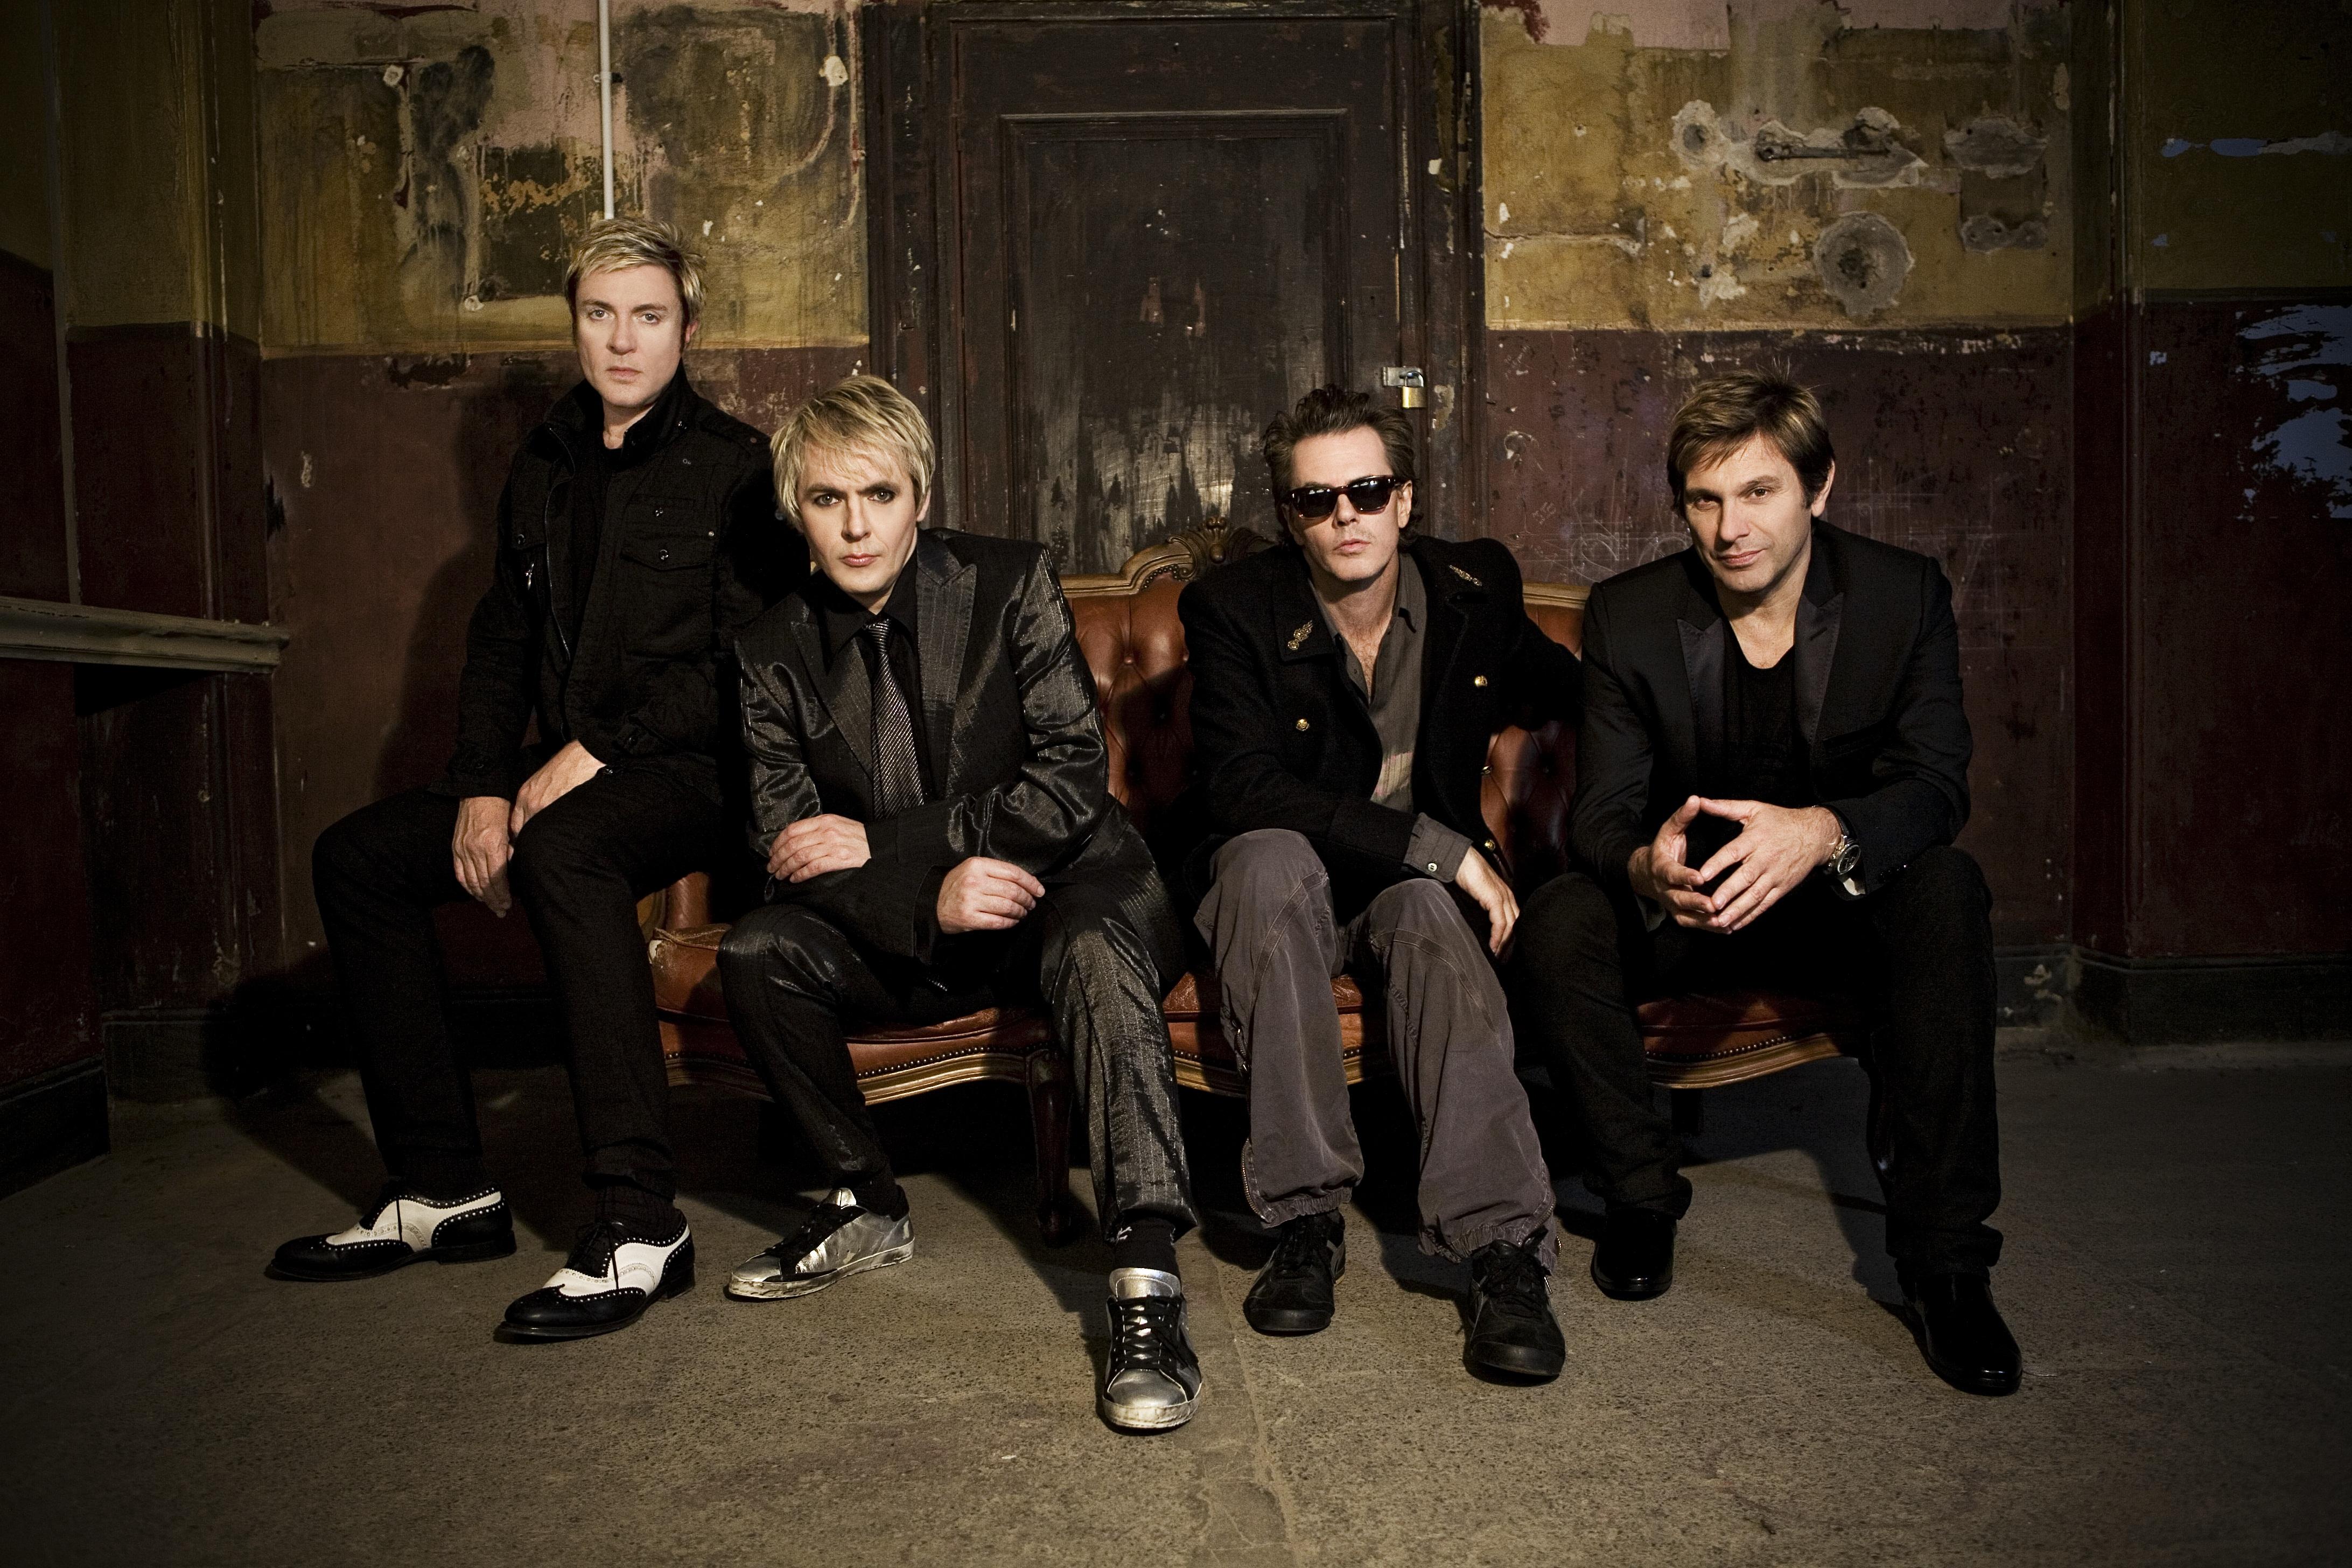 The Quietus   Features   A Quietus Interview   Boys On Film  Duran Duran  Interviewed. The Quietus   Features   A Quietus Interview   Boys On Film  Duran